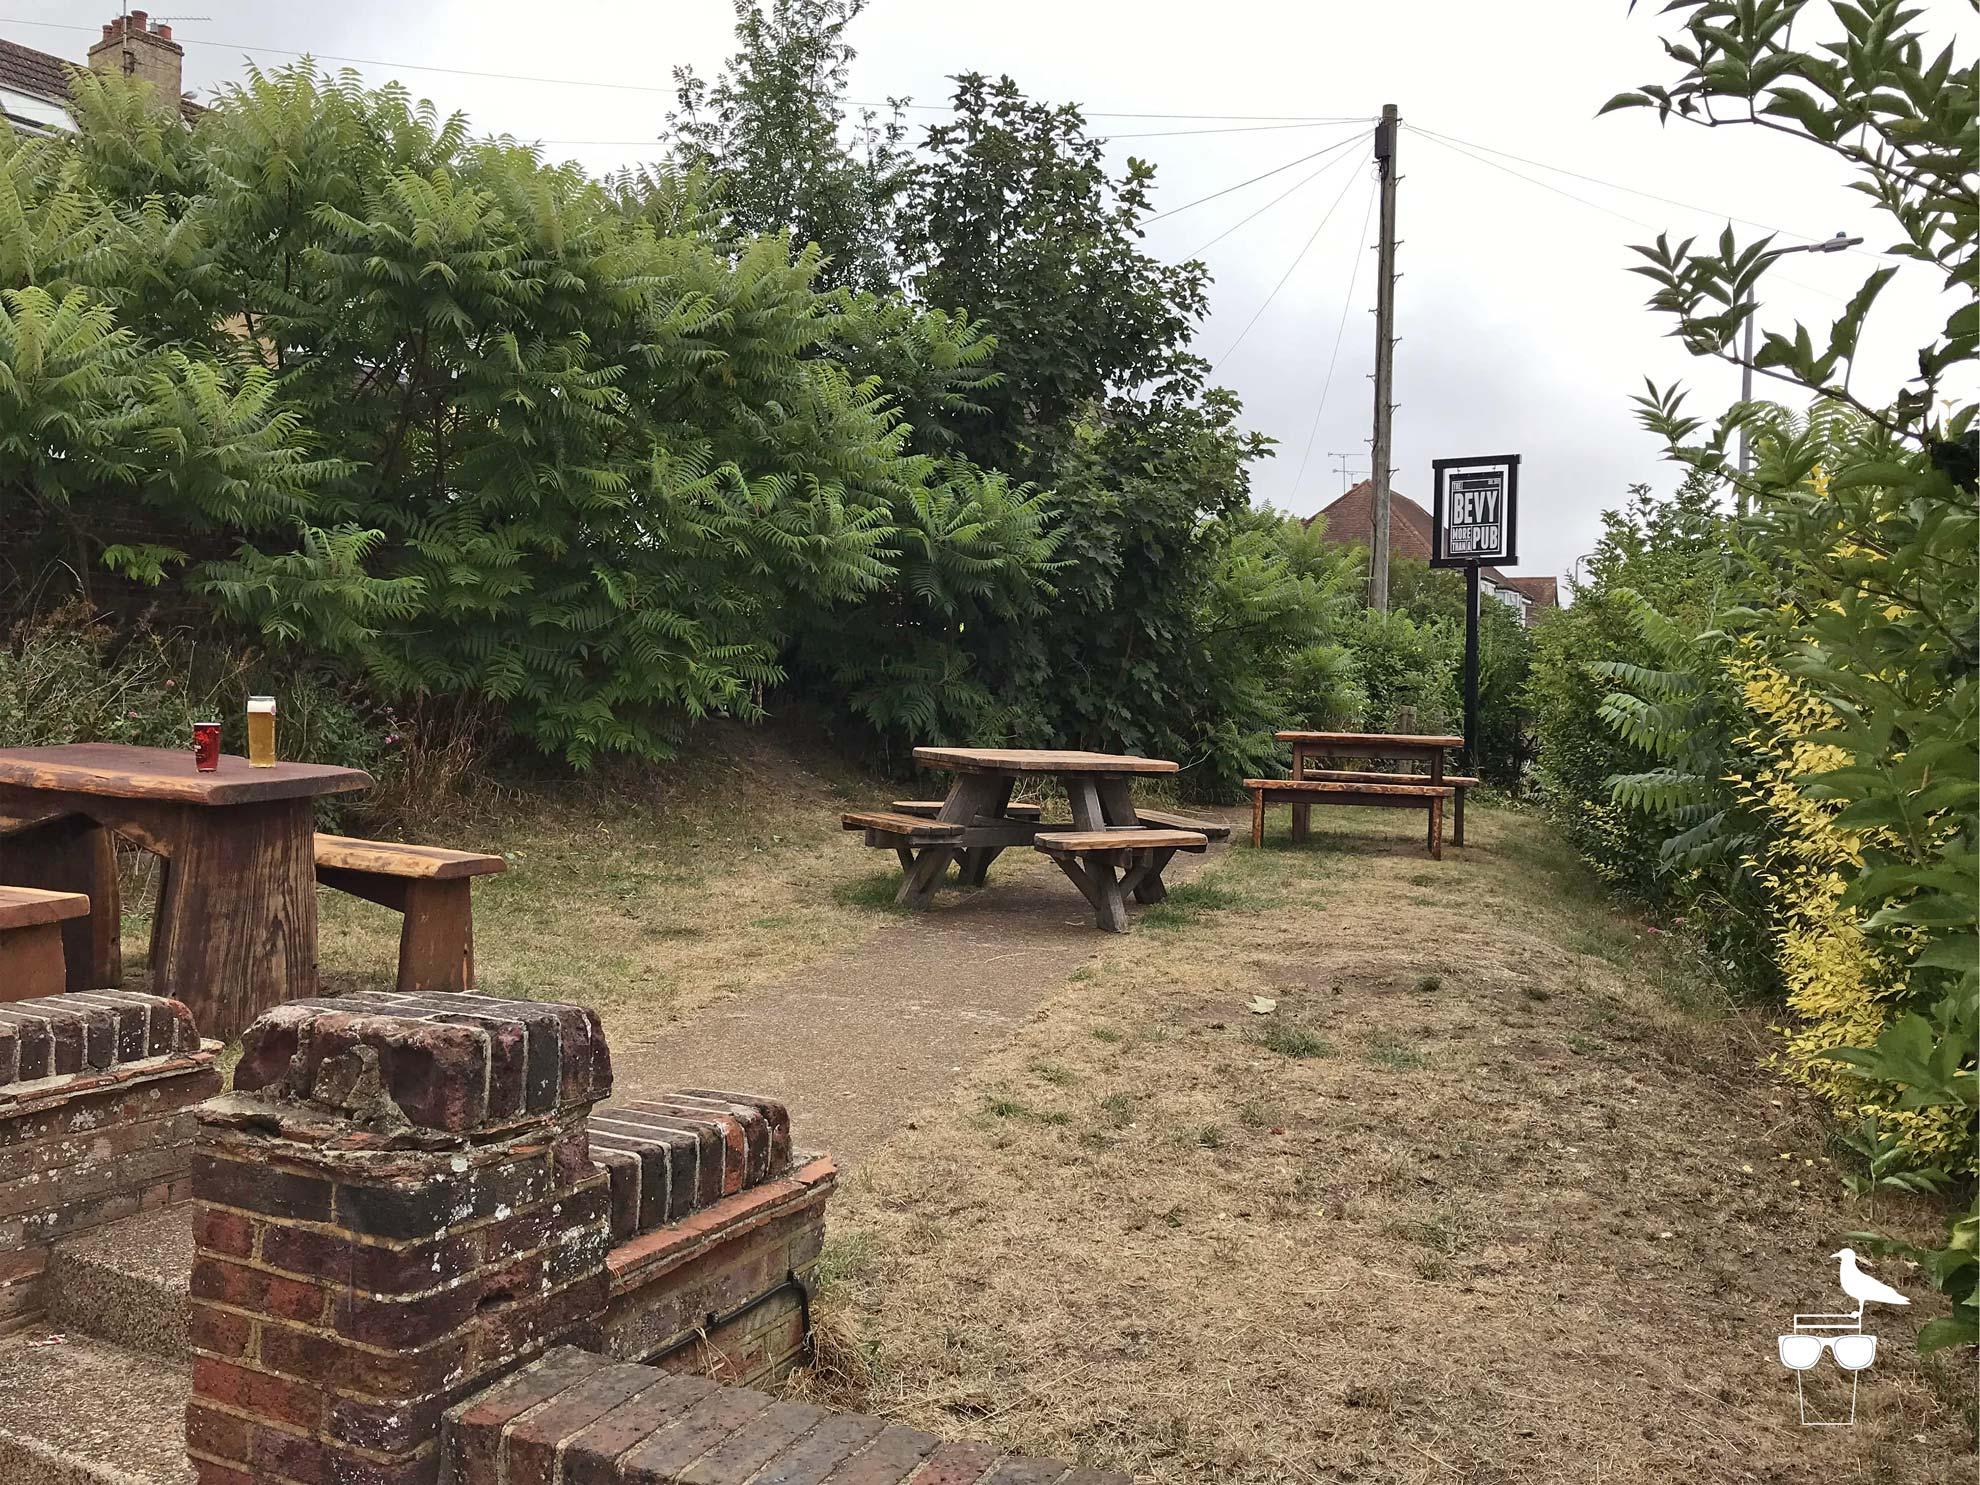 the-bevy-pub-bevendean-garden-2